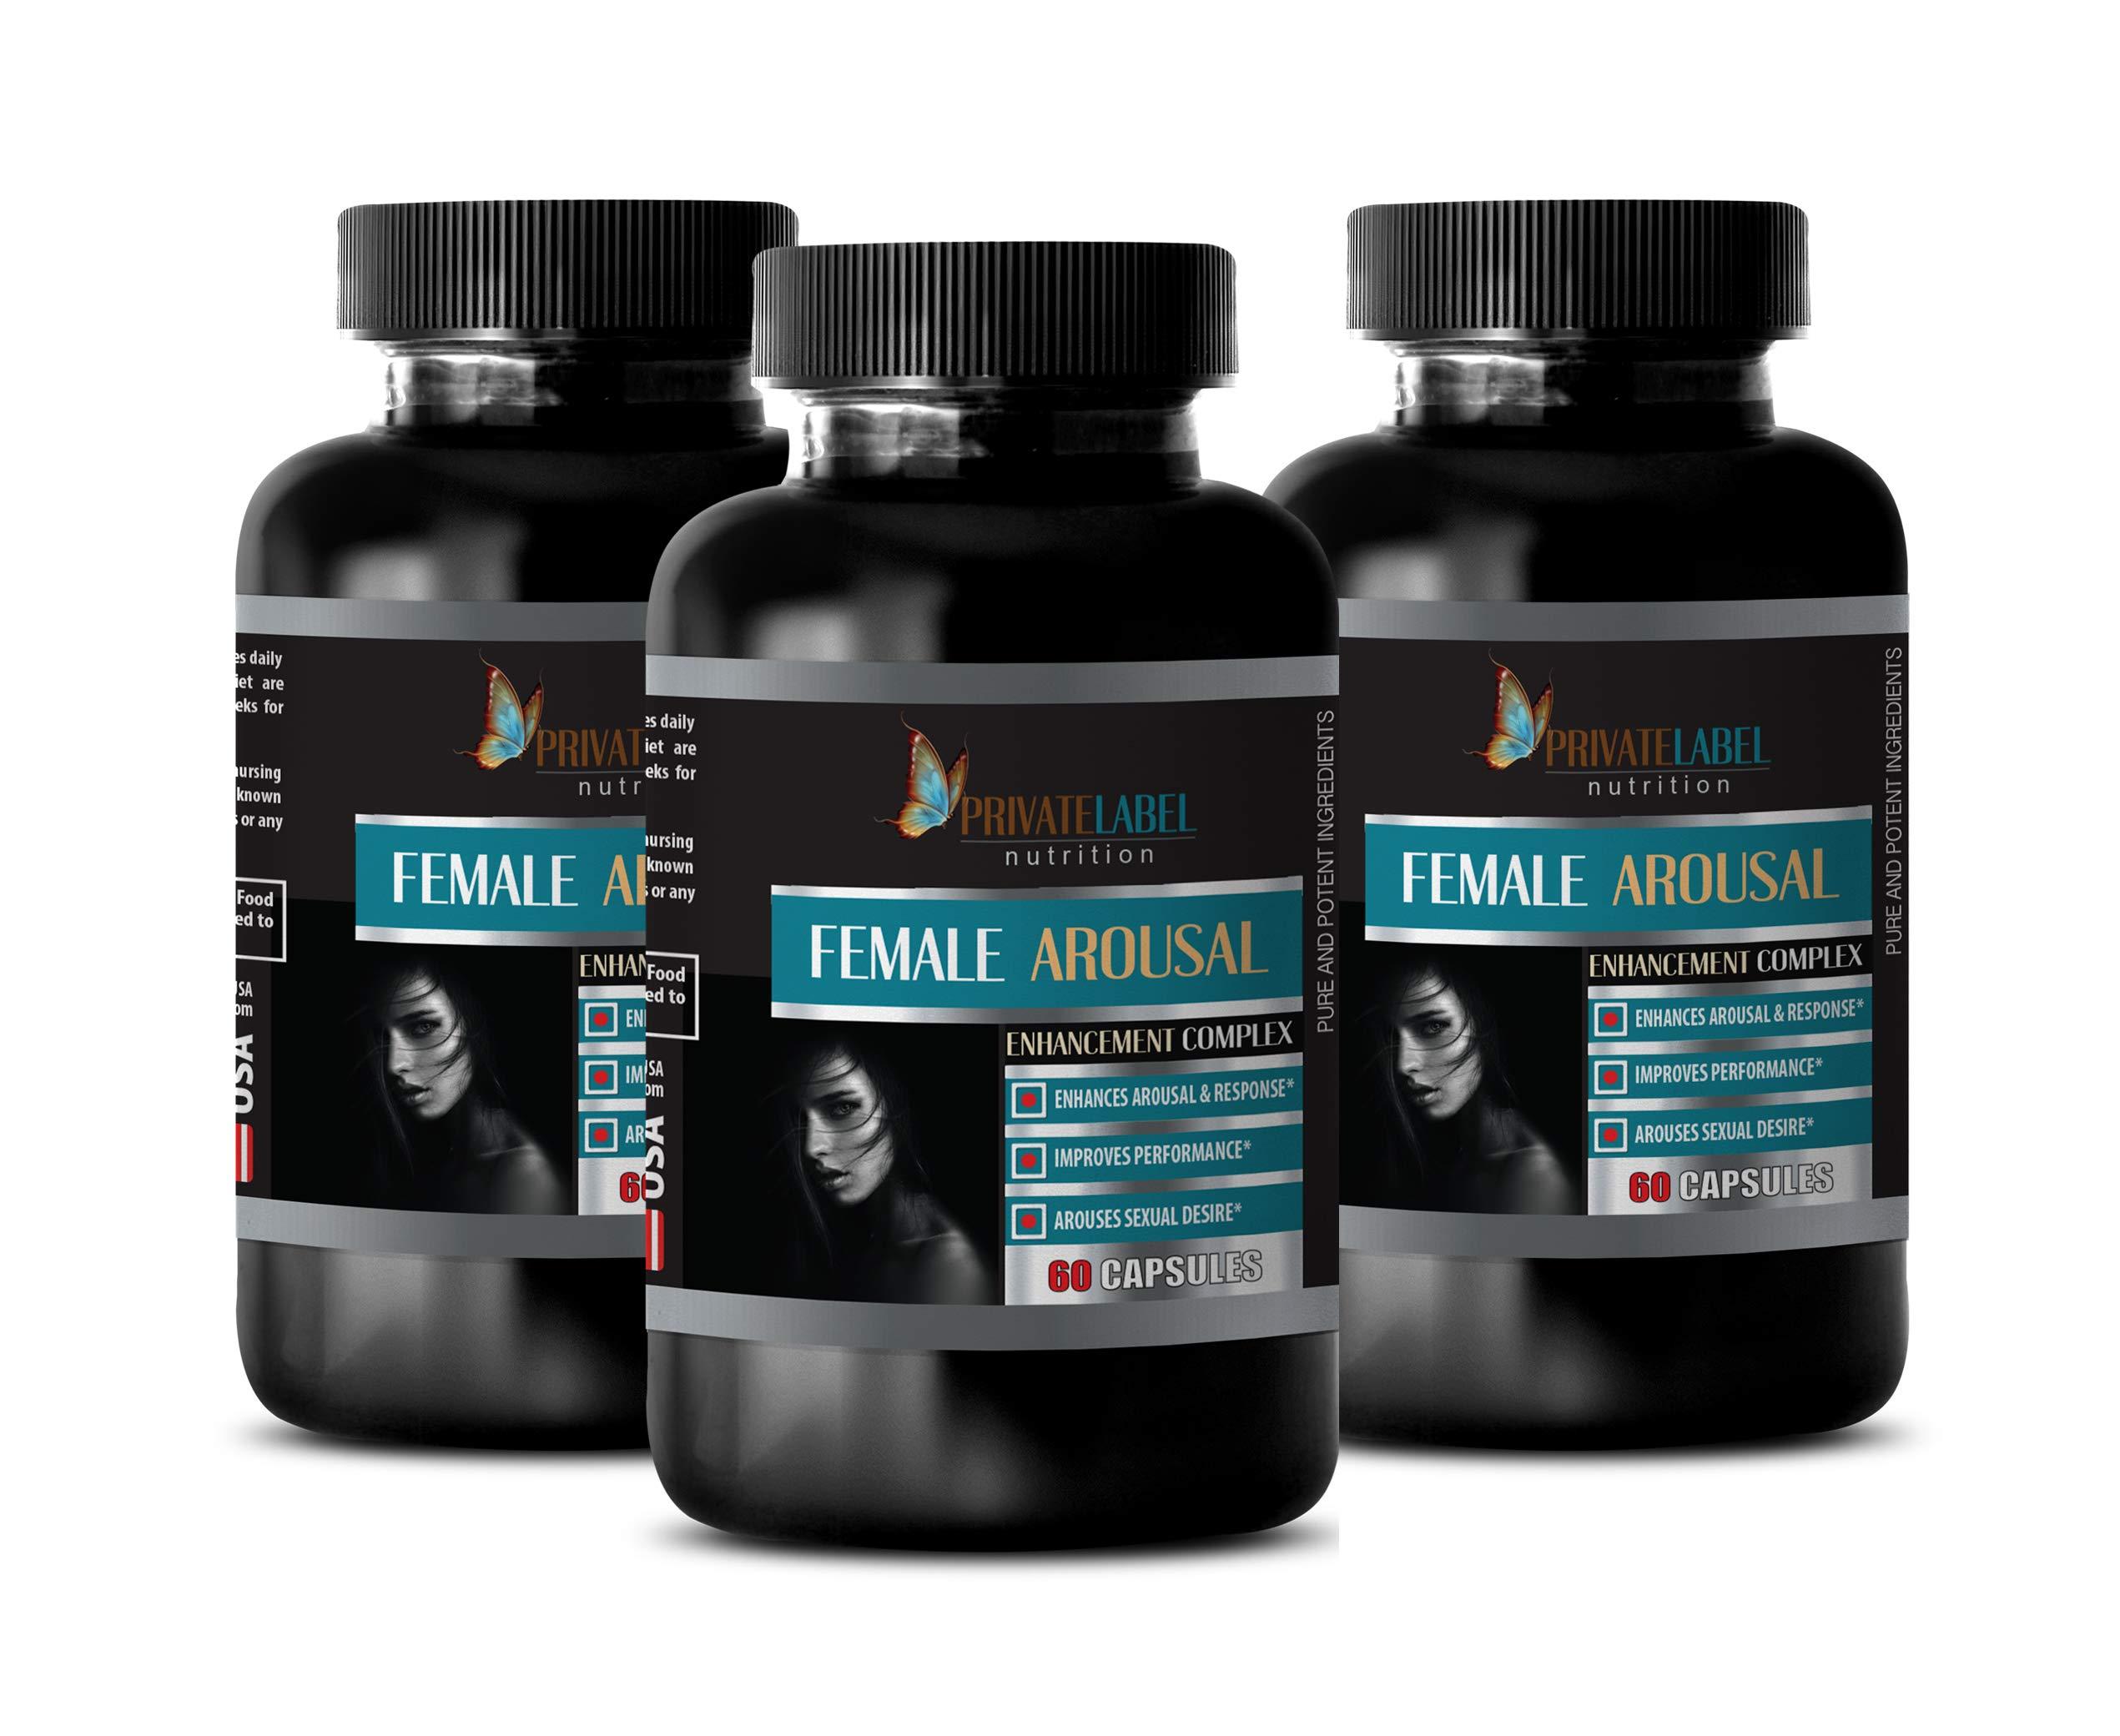 Women libido Booster - Female Arousal Enhancement Complex - Improves Performance - Muira puama Women - 3 Bottles 180 Capsules